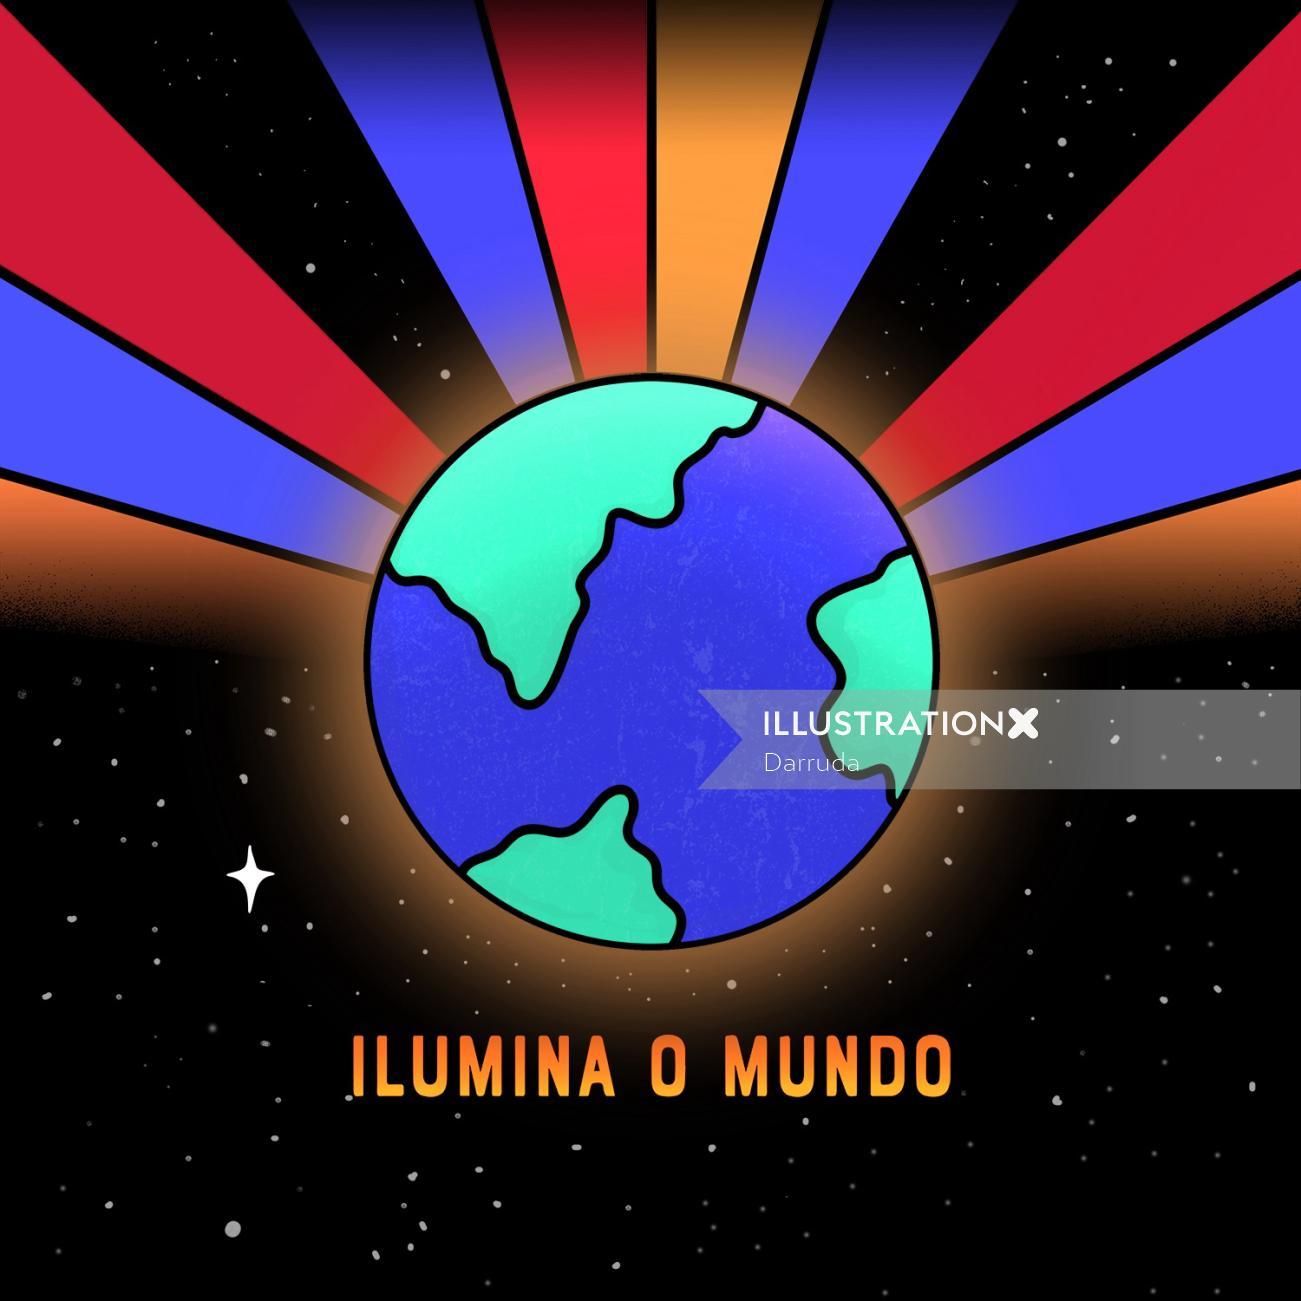 Ilumina o mundo music band cover